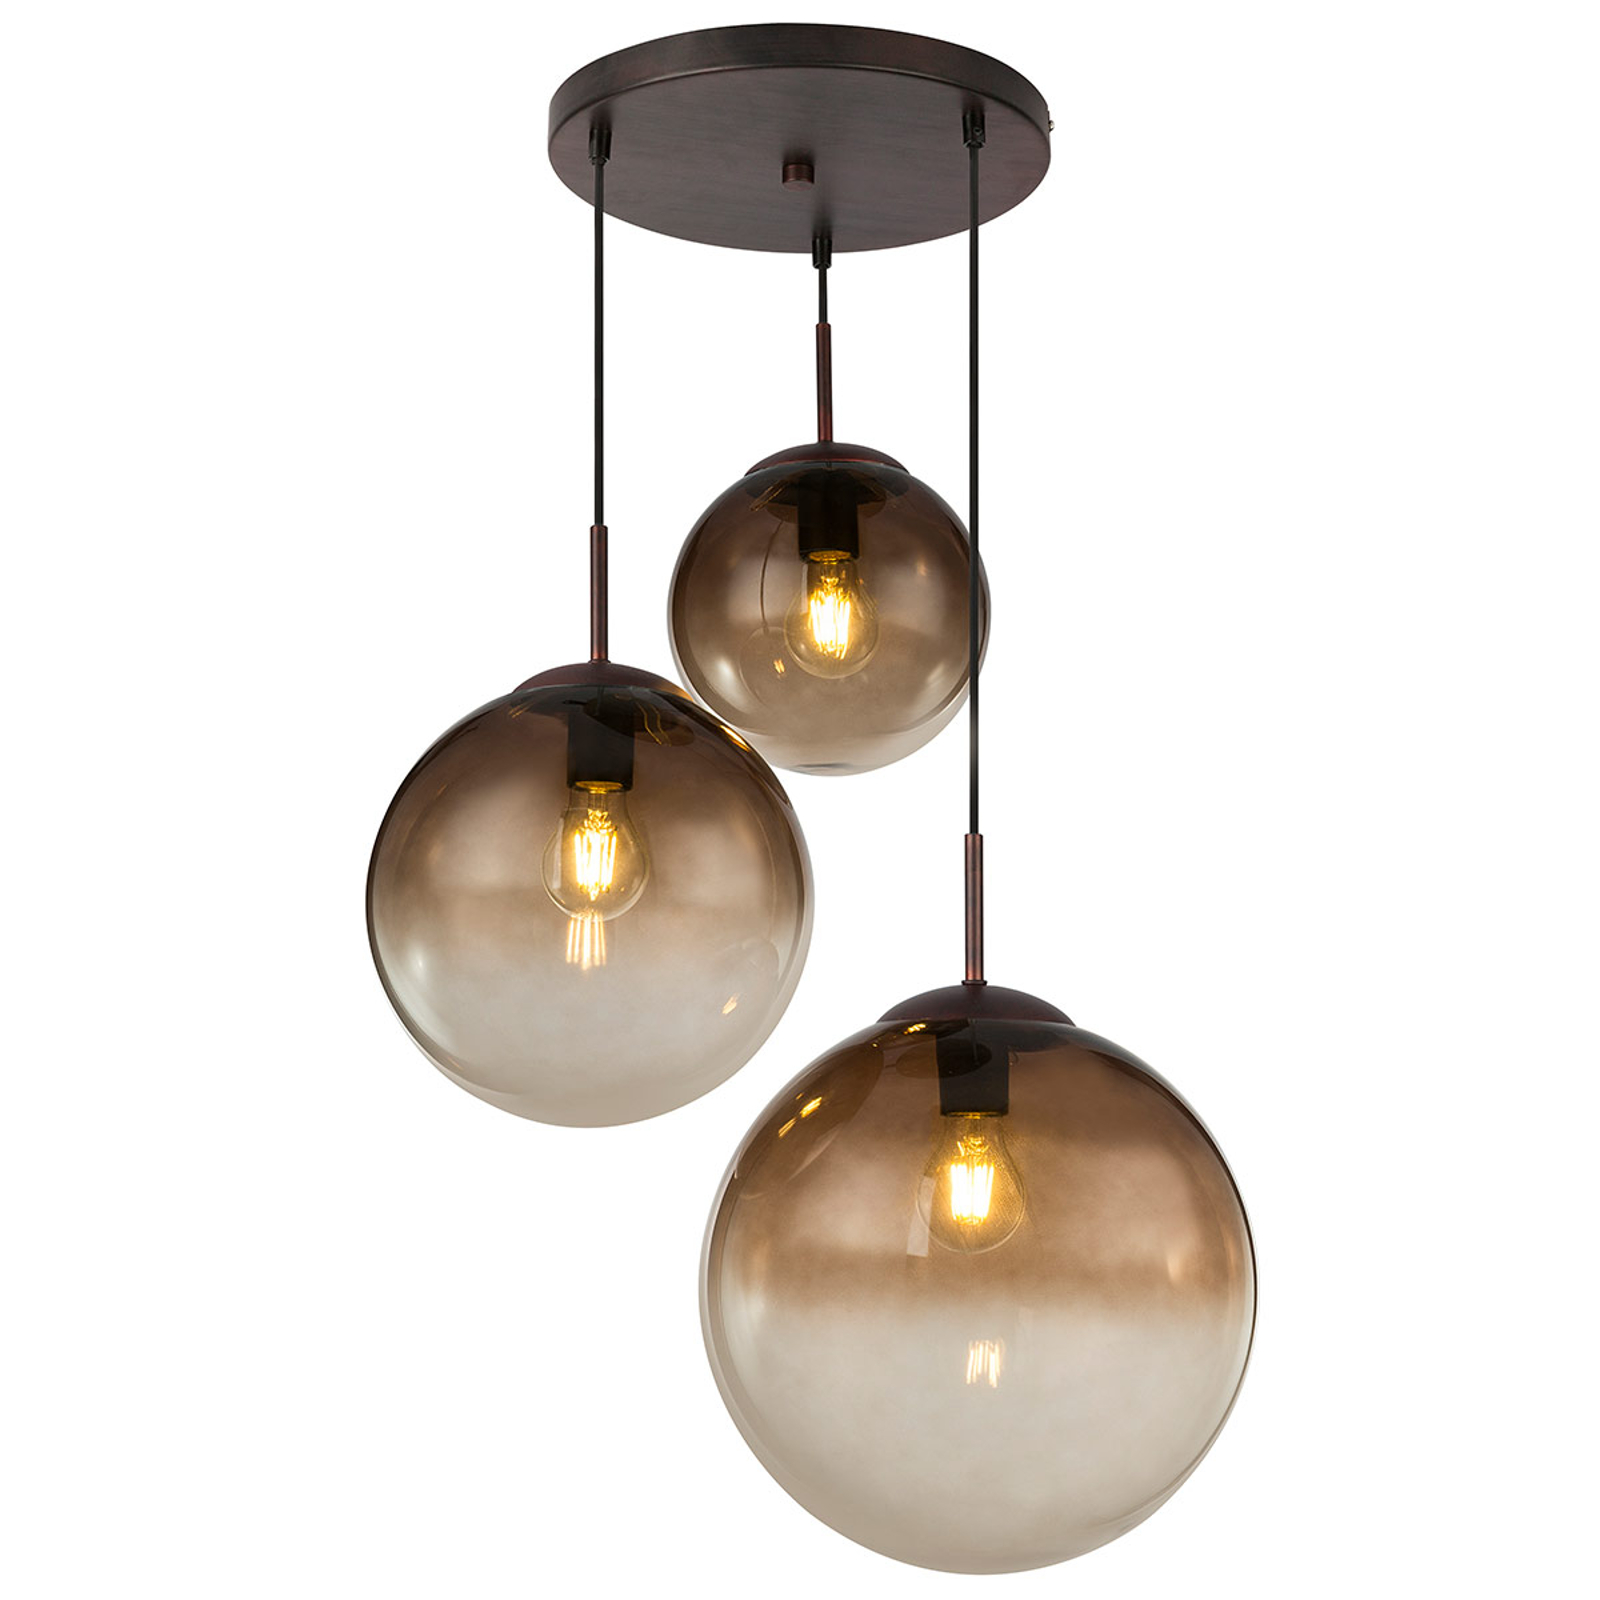 Suspension verre Varus ambre 3 lampes Ø 51cm